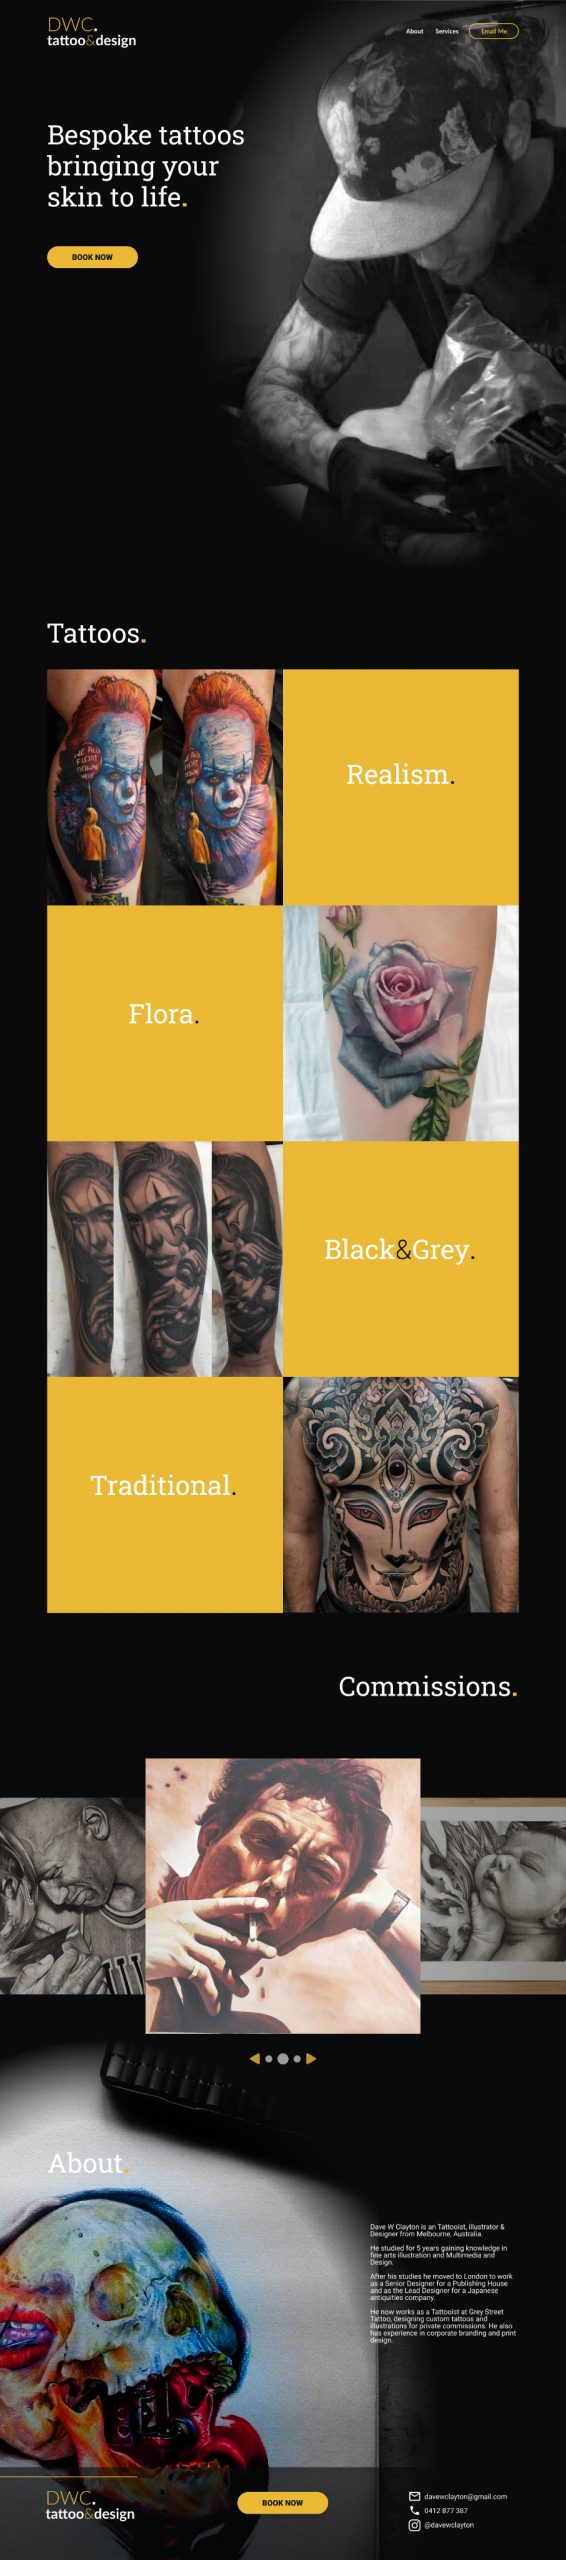 DWC Tattoo website design